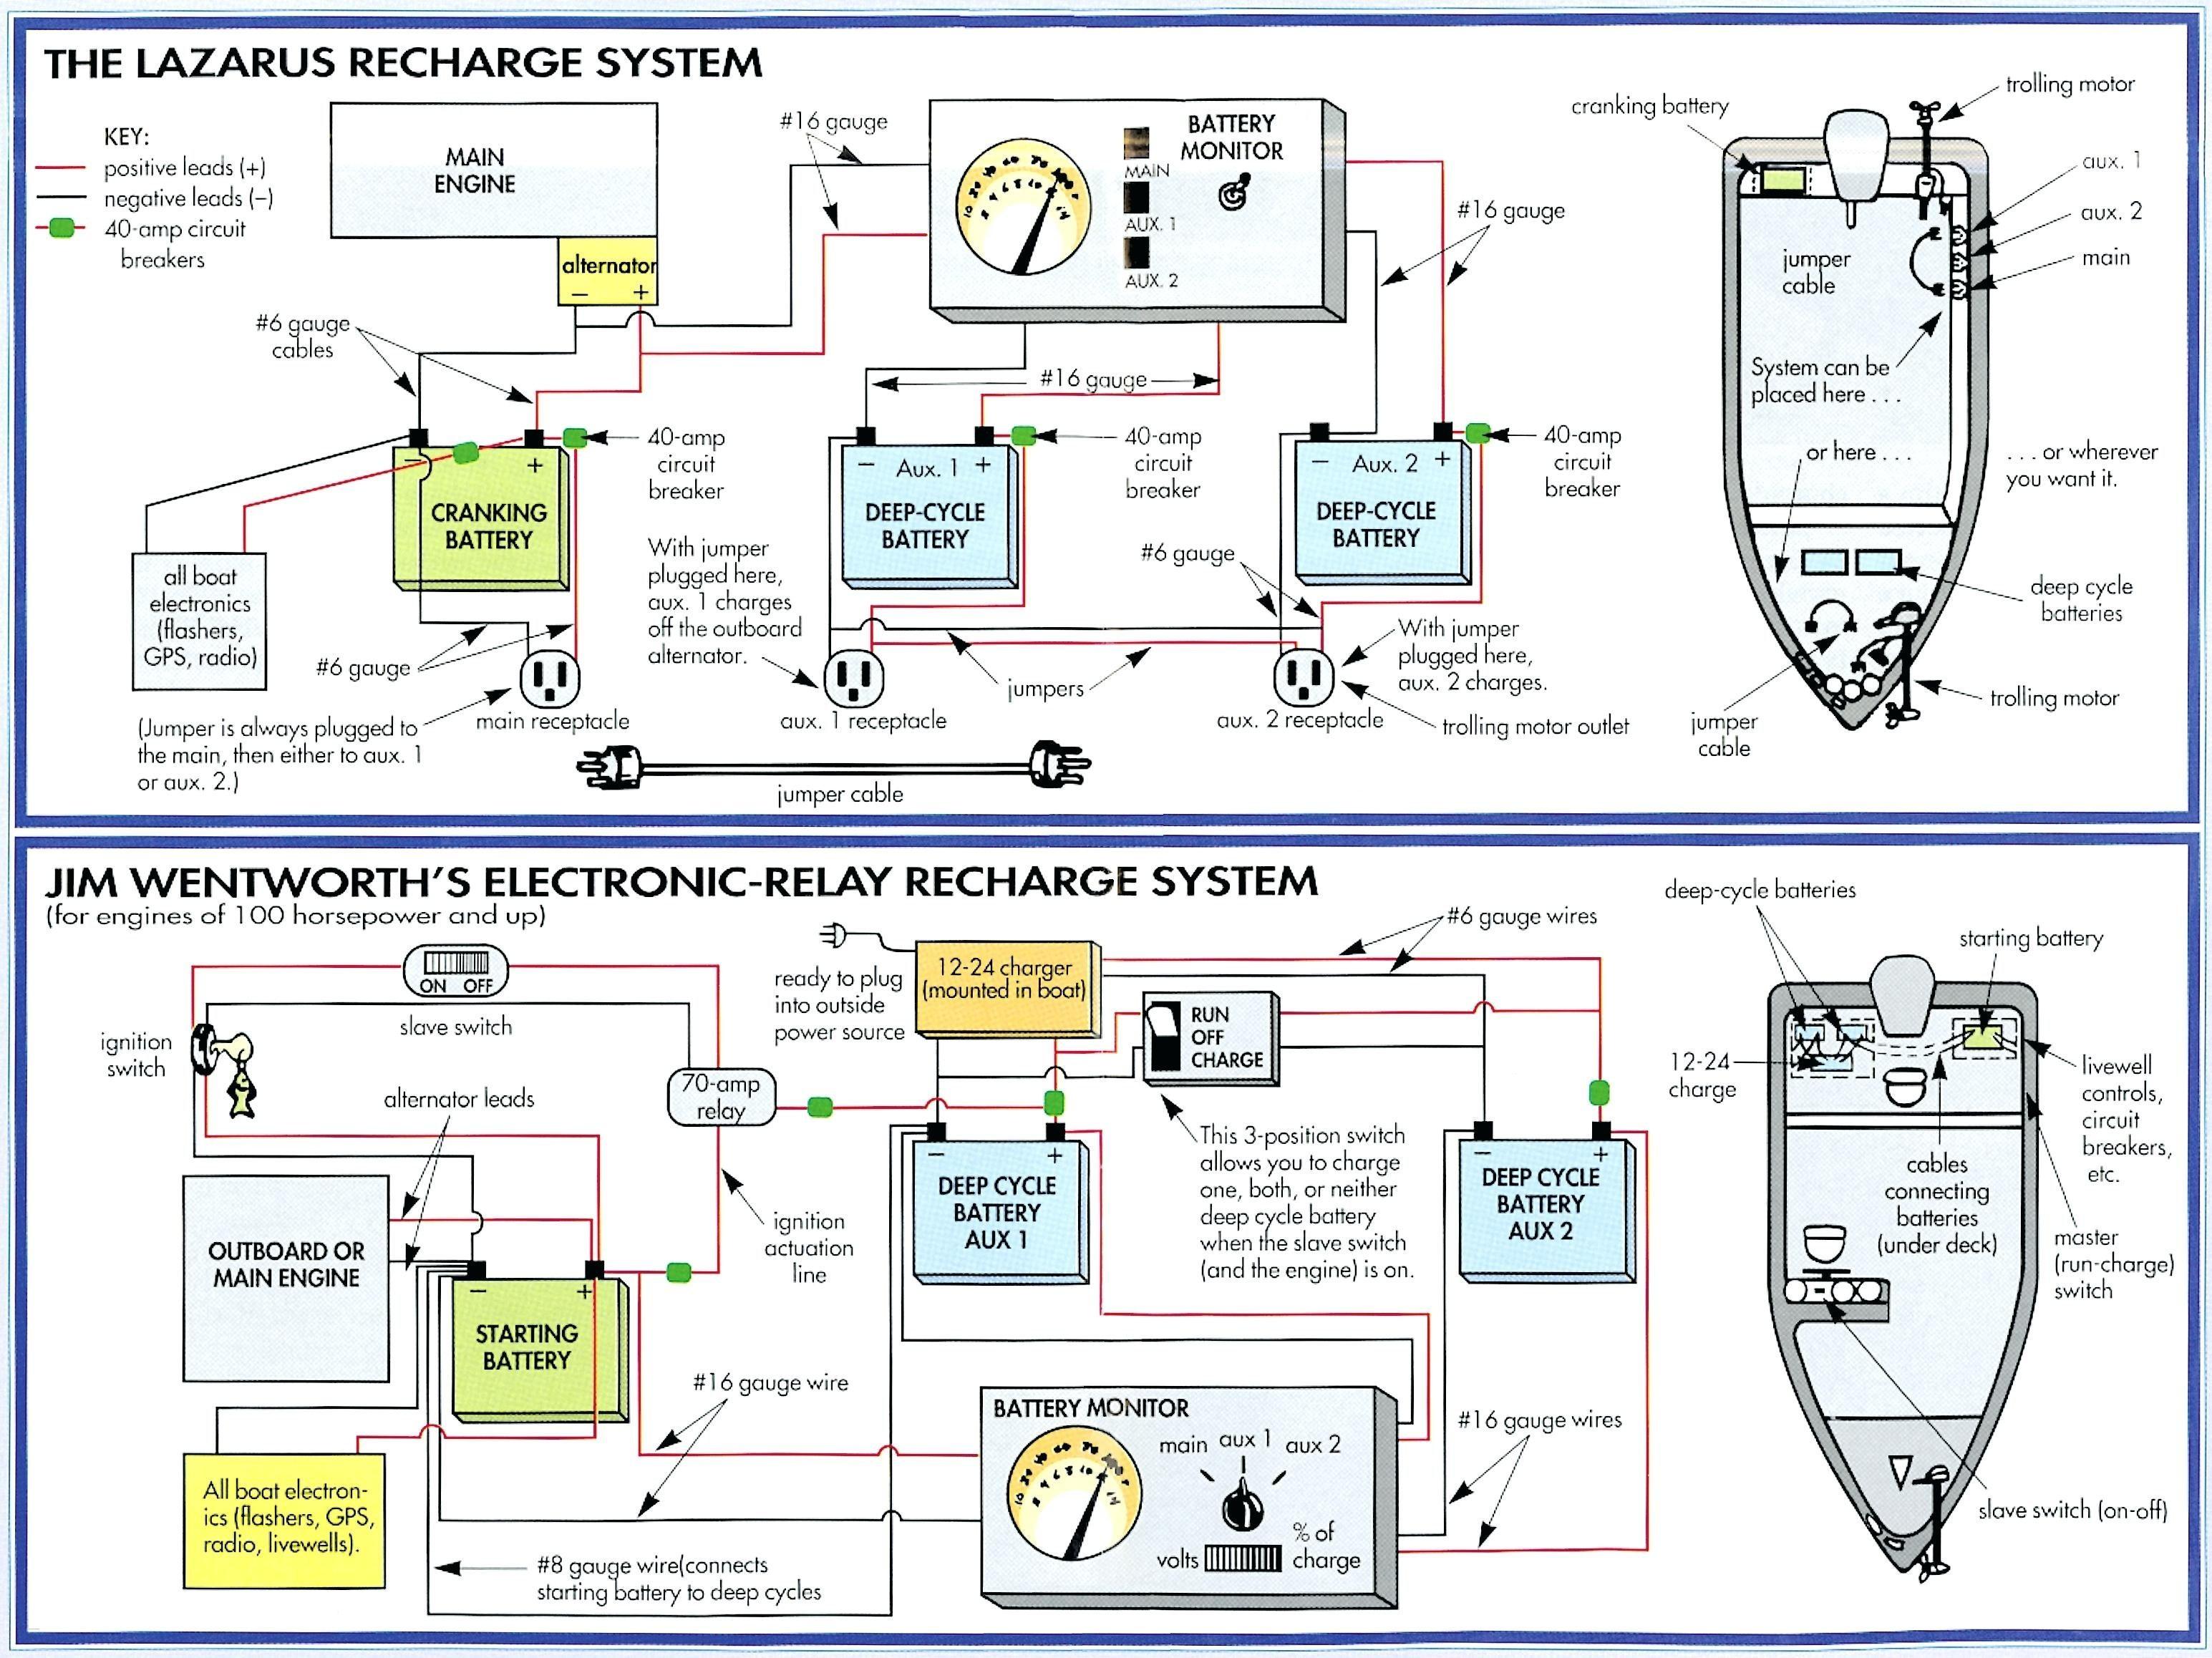 jon boat wiring kit inspirational legend boat wiring diagram amp yamaha qt50 wiring diagram yamaha qt50 of jon boat wiring kit 1979 yamaha 650 special wiring diagram schematic diagrams